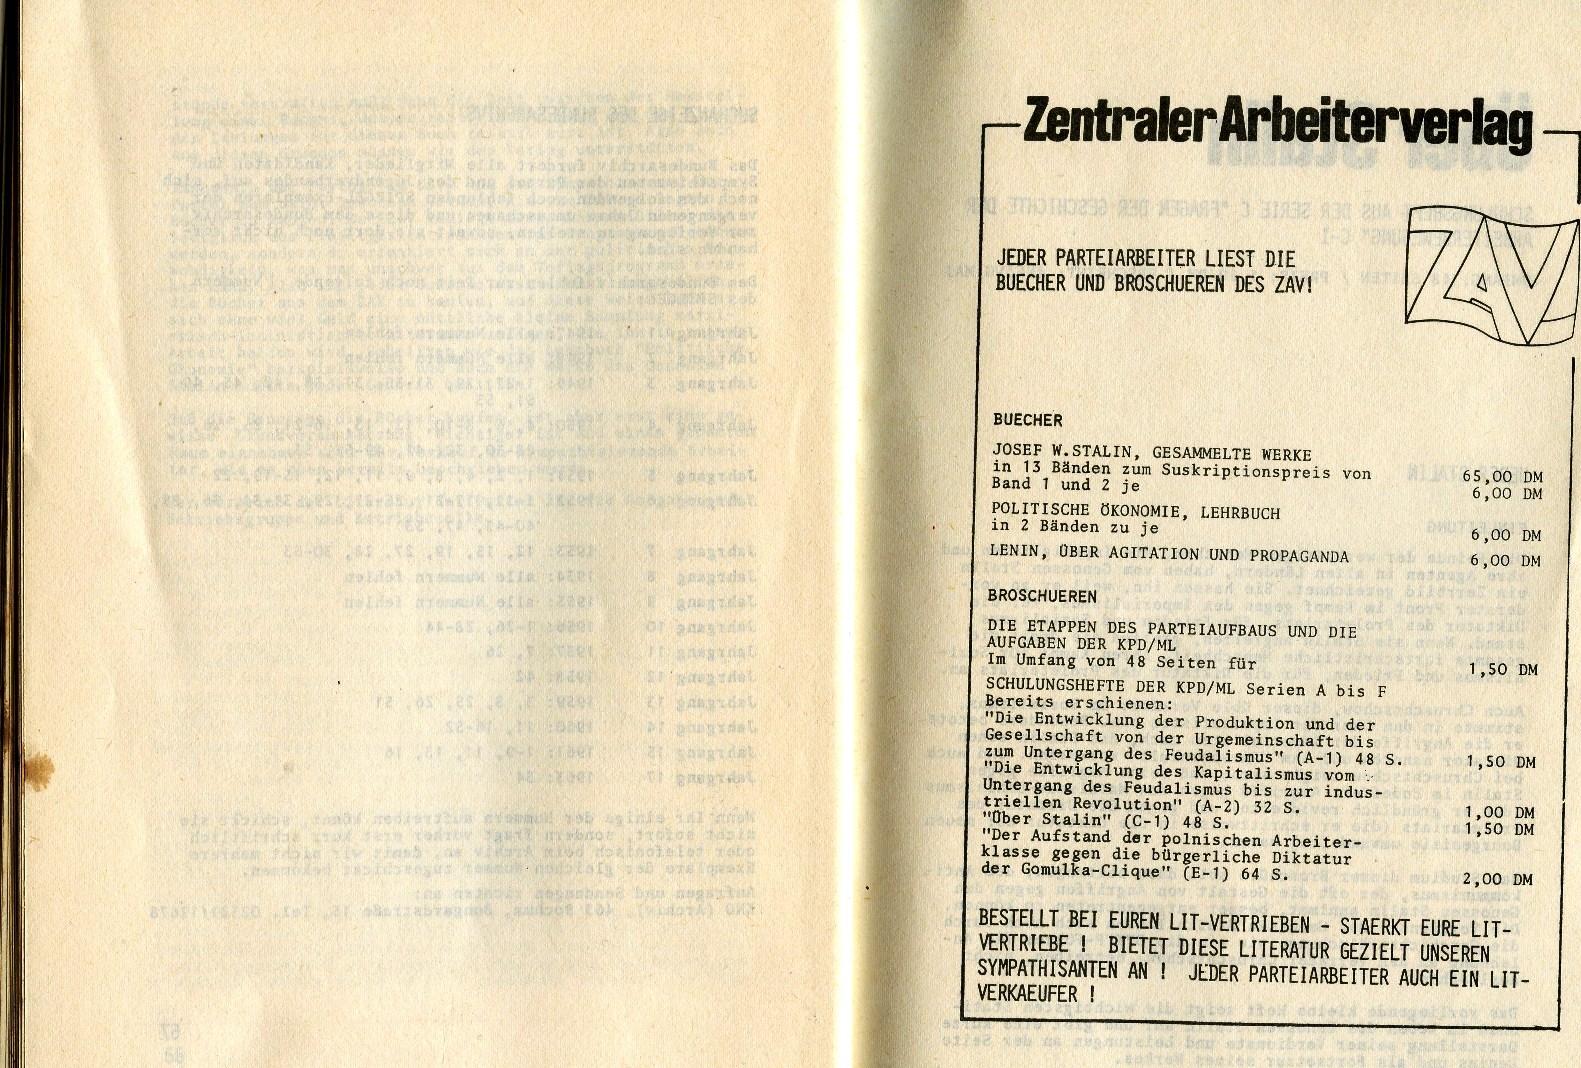 ZB_Parteiarbeiter_1971_05_36